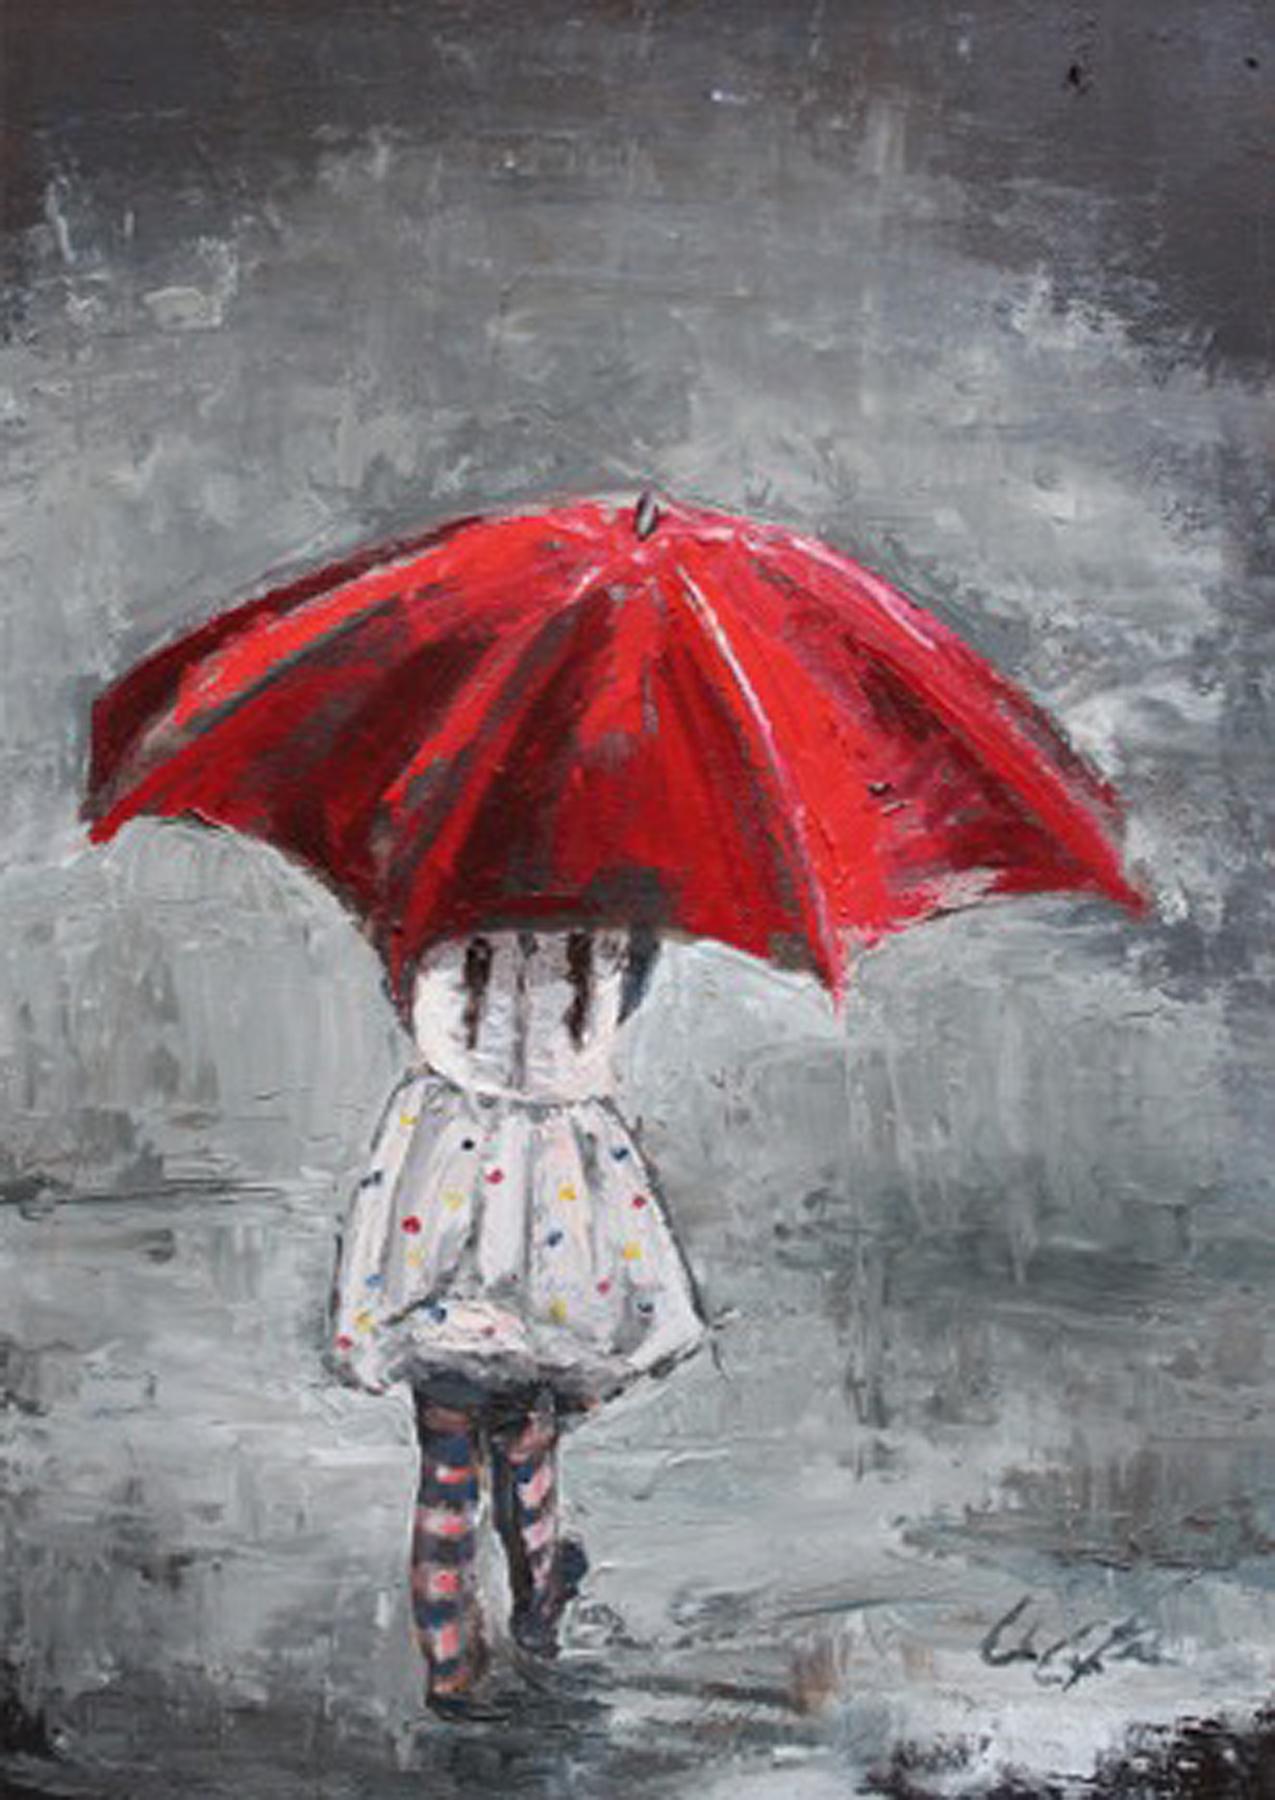 Walking in Raindrops